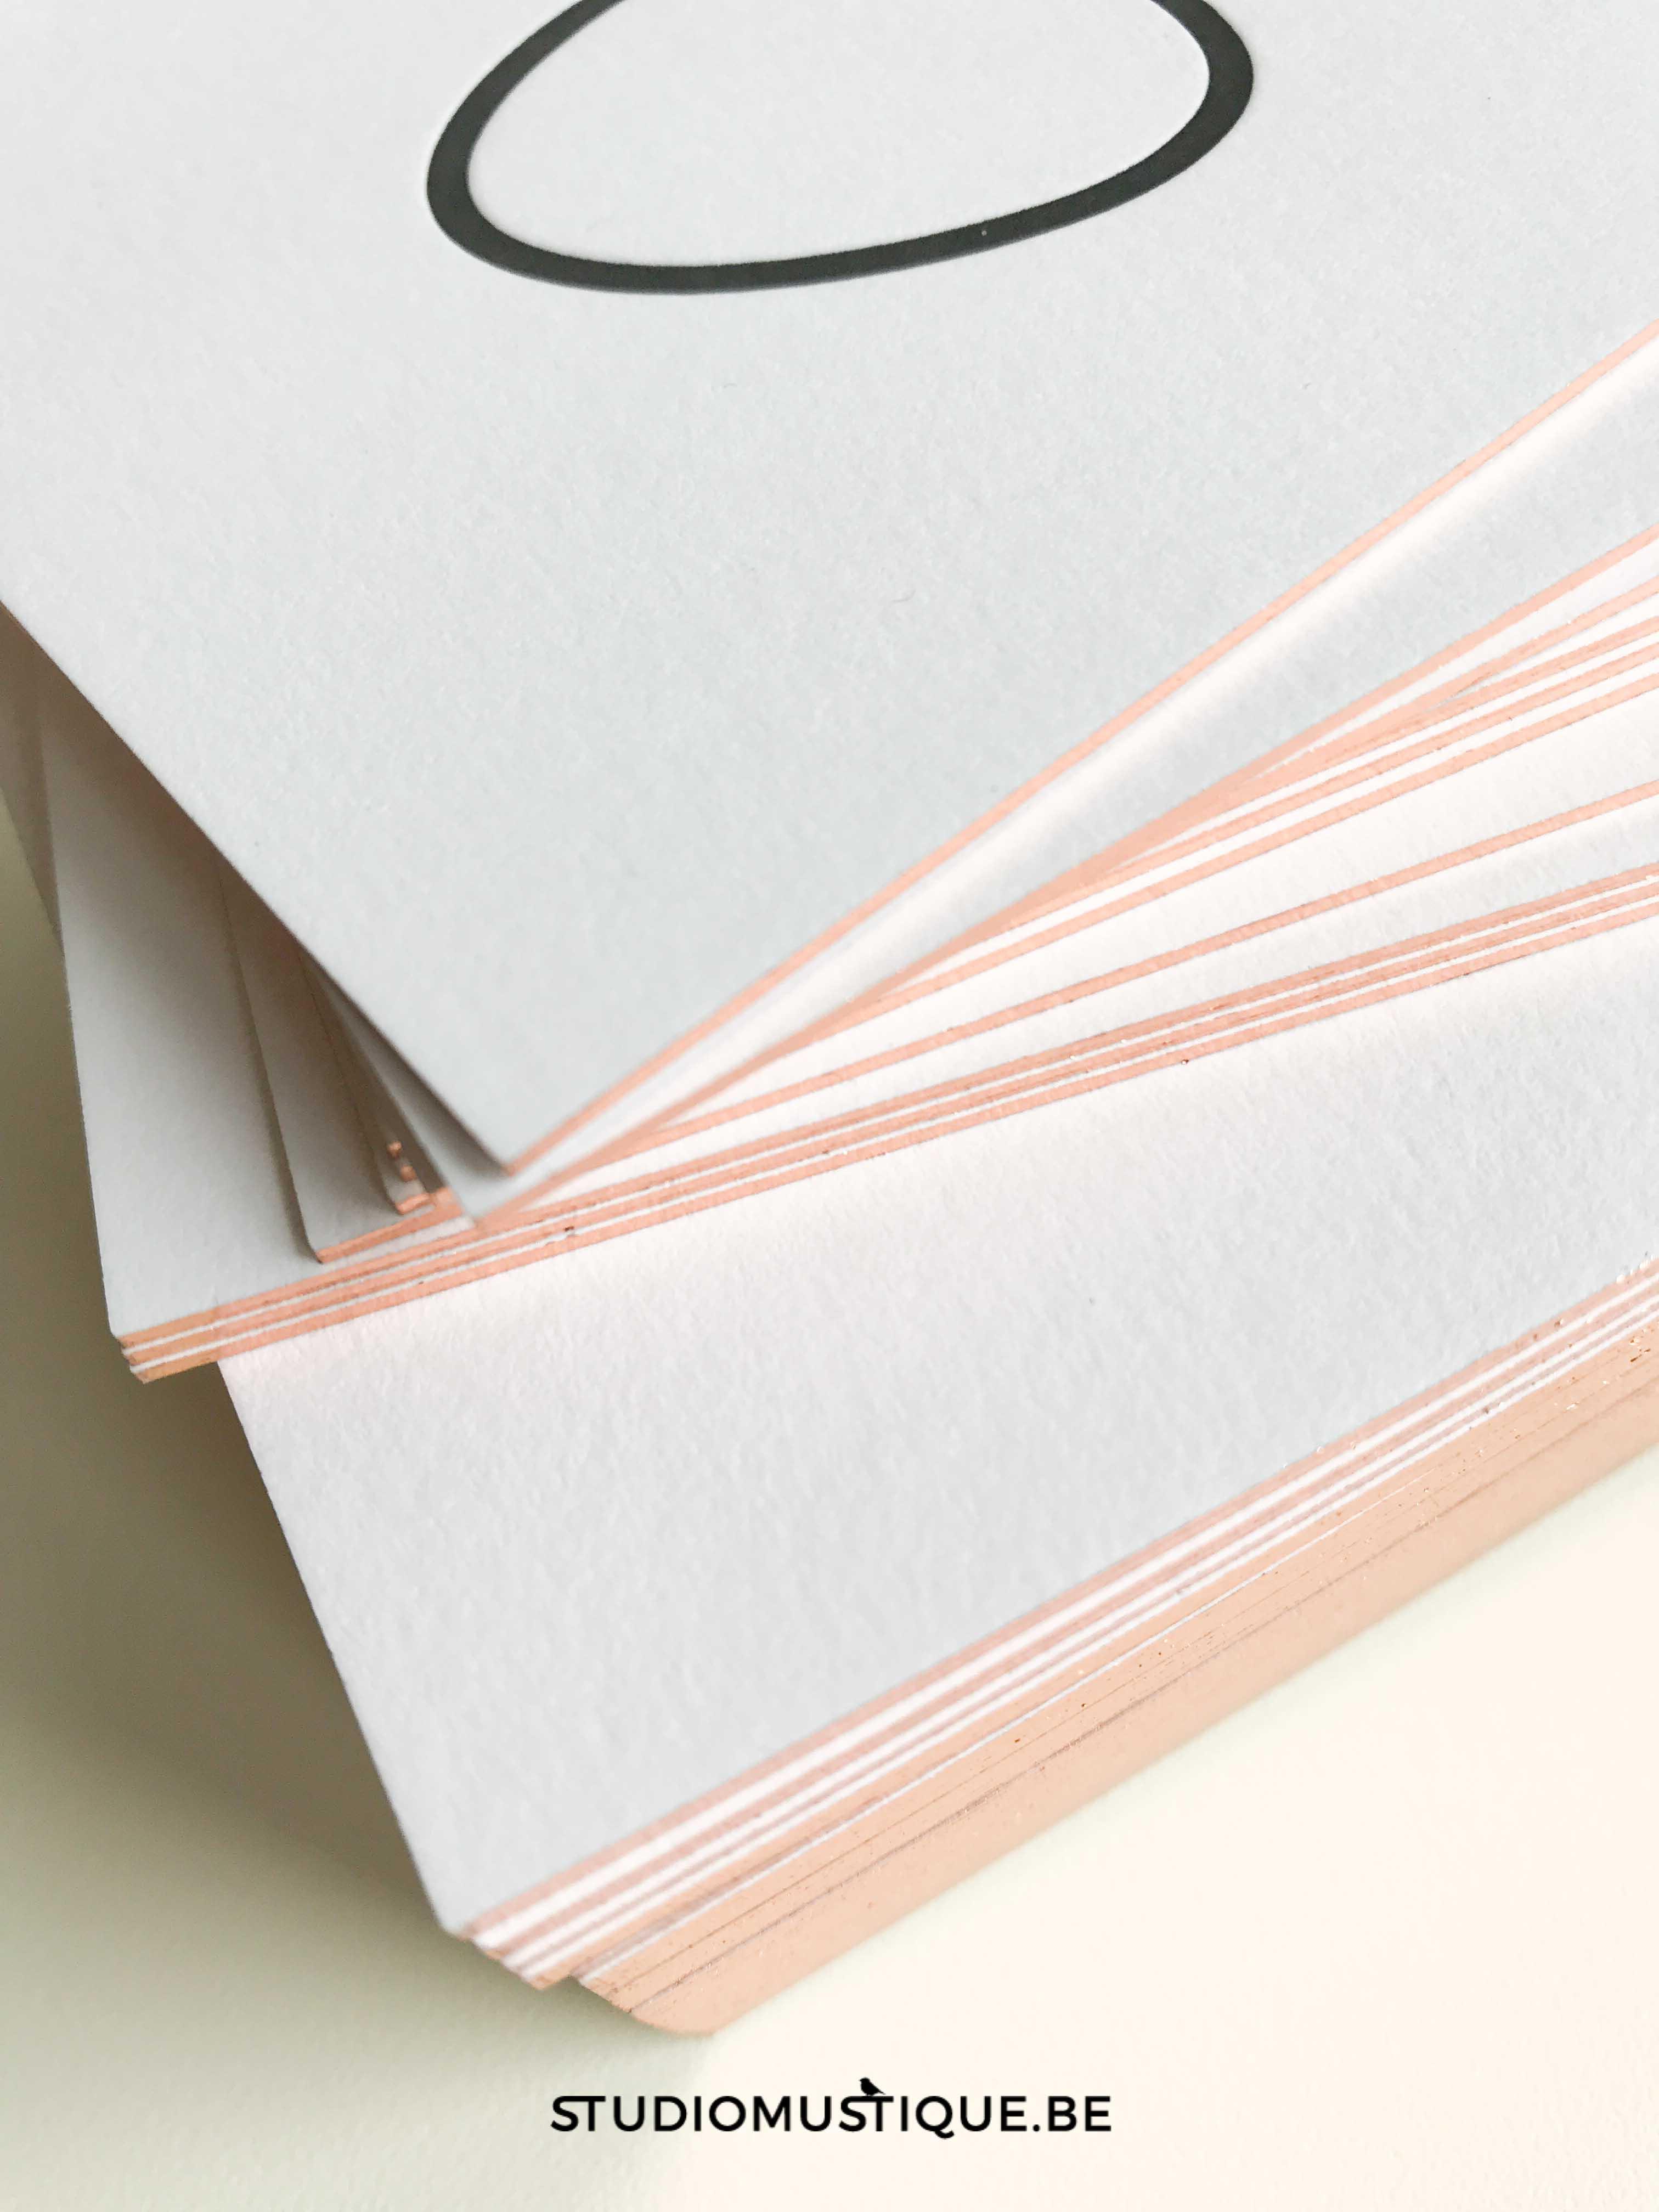 Geboortekaartje letterpress Jackie folie op snee, minimalistisch, sierlijk handwriting